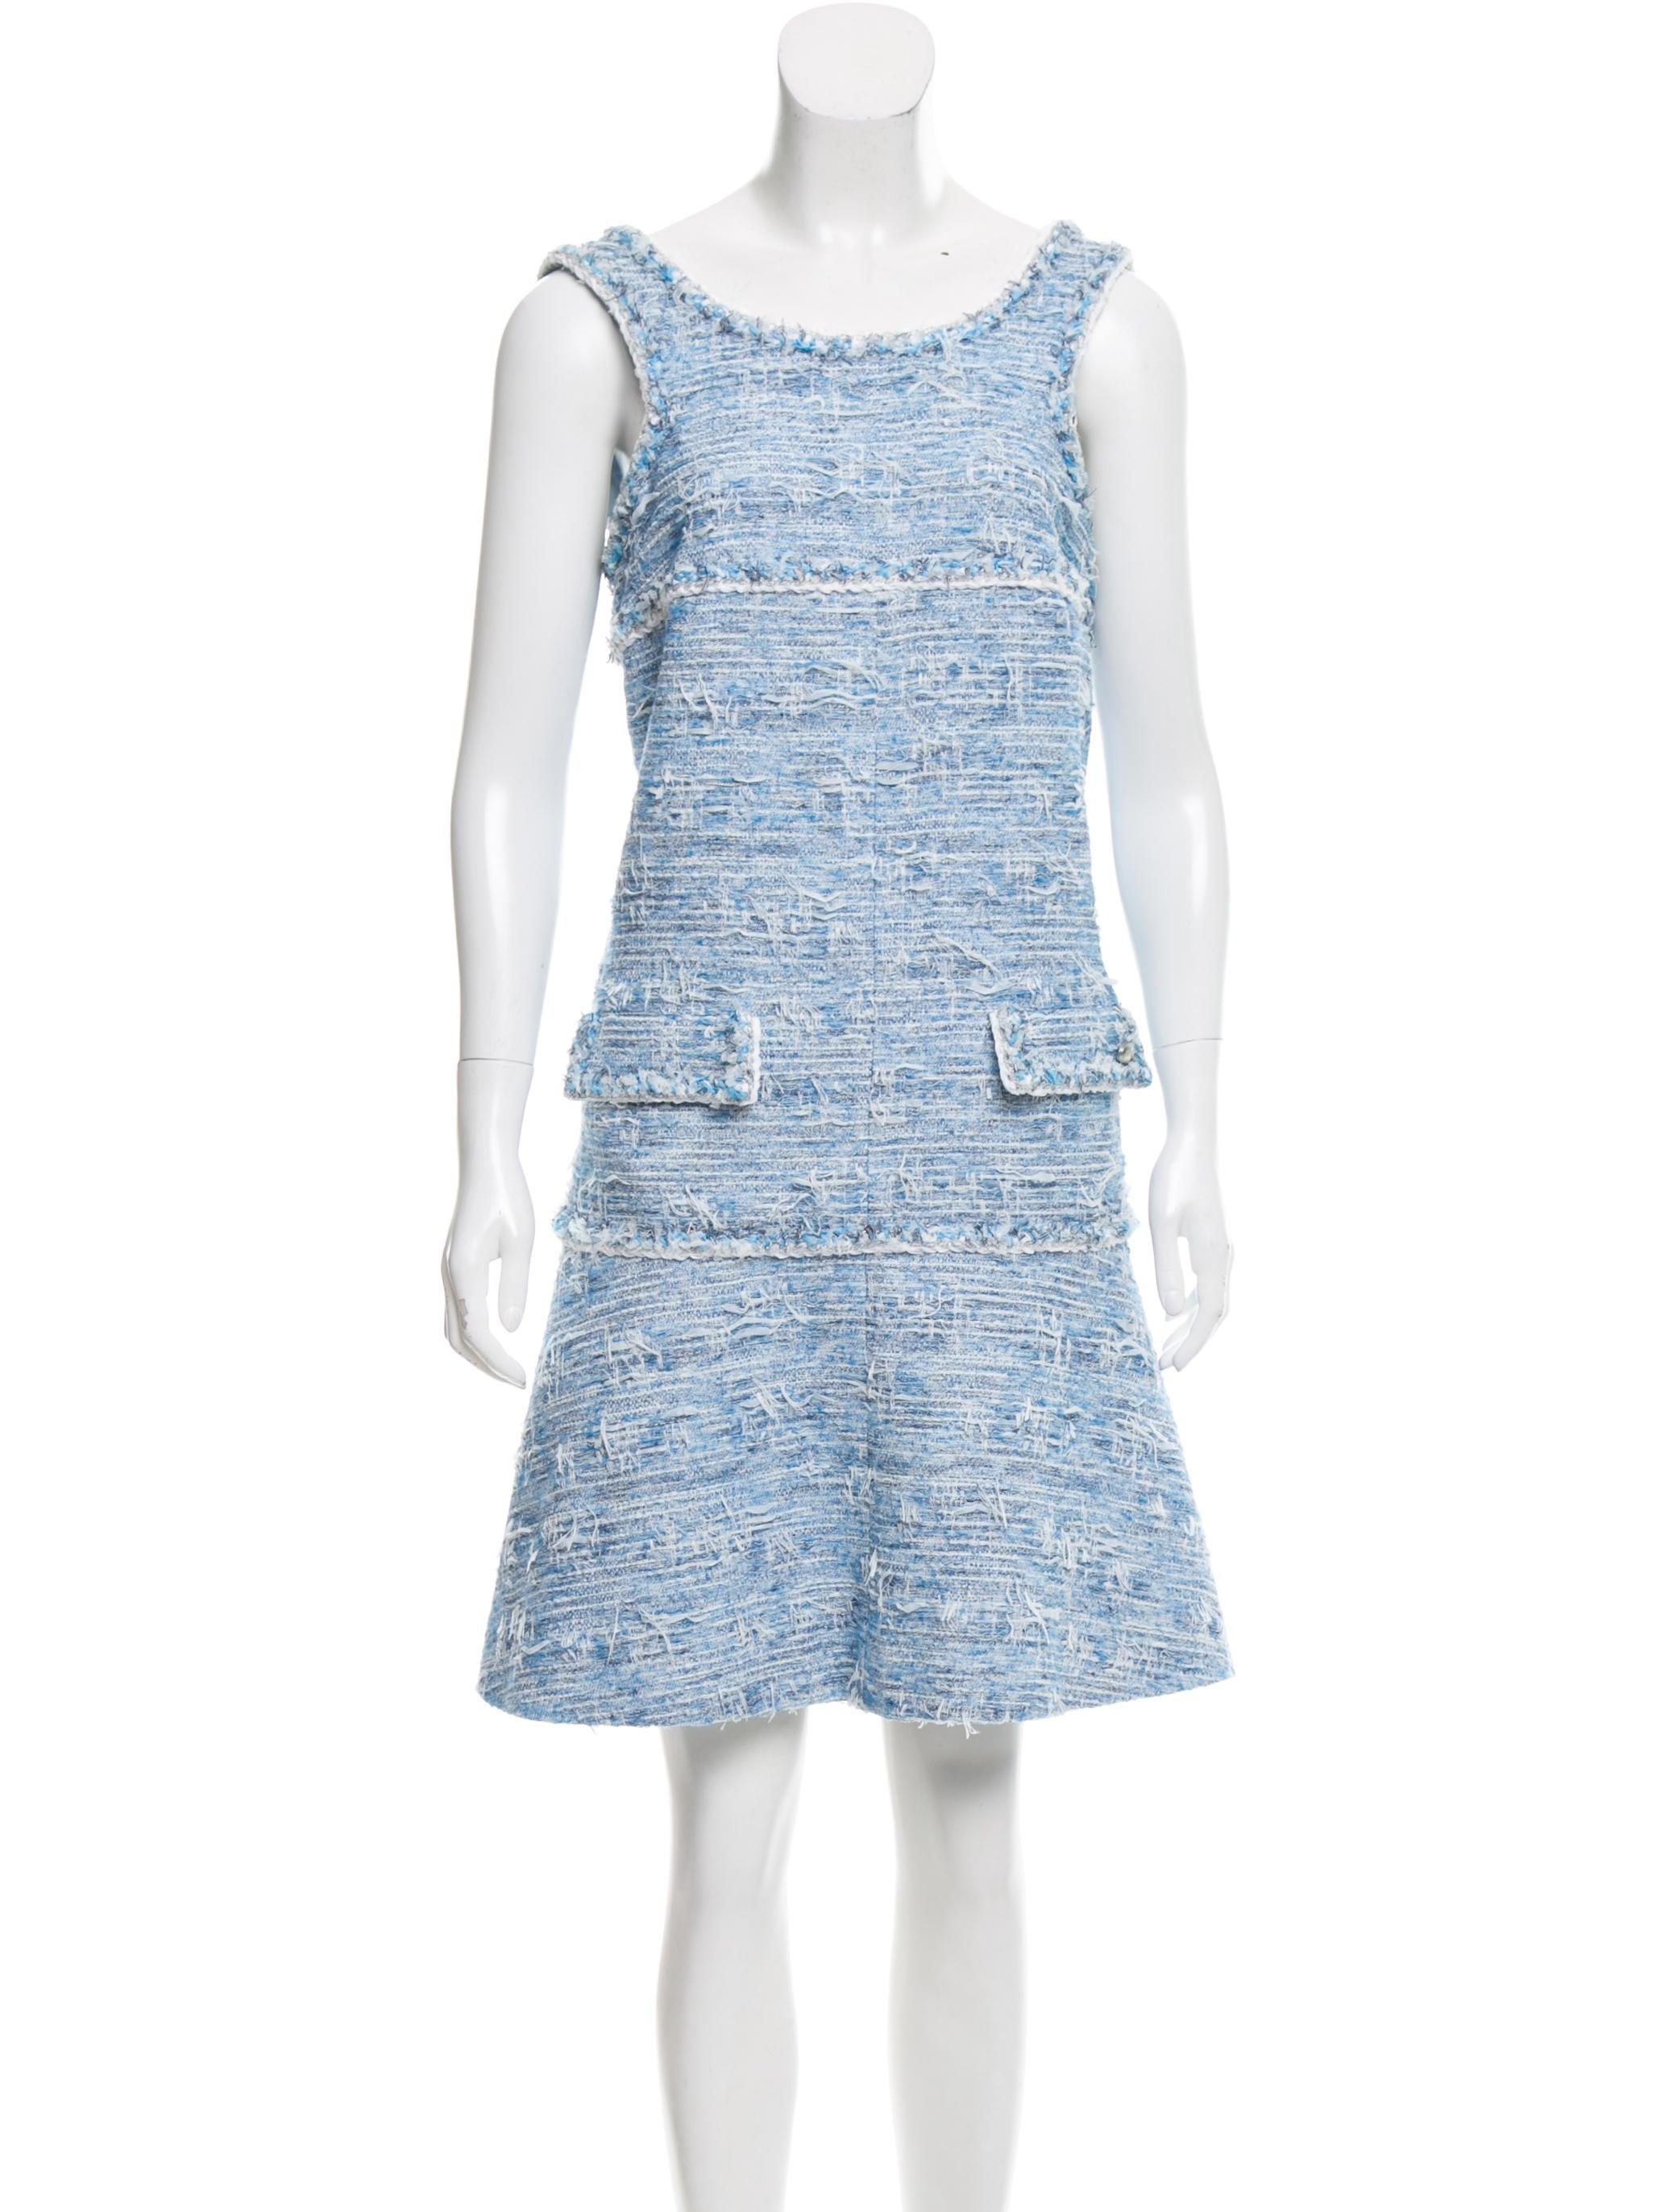 Chanel 2015 Sleeveless Tweed Dress